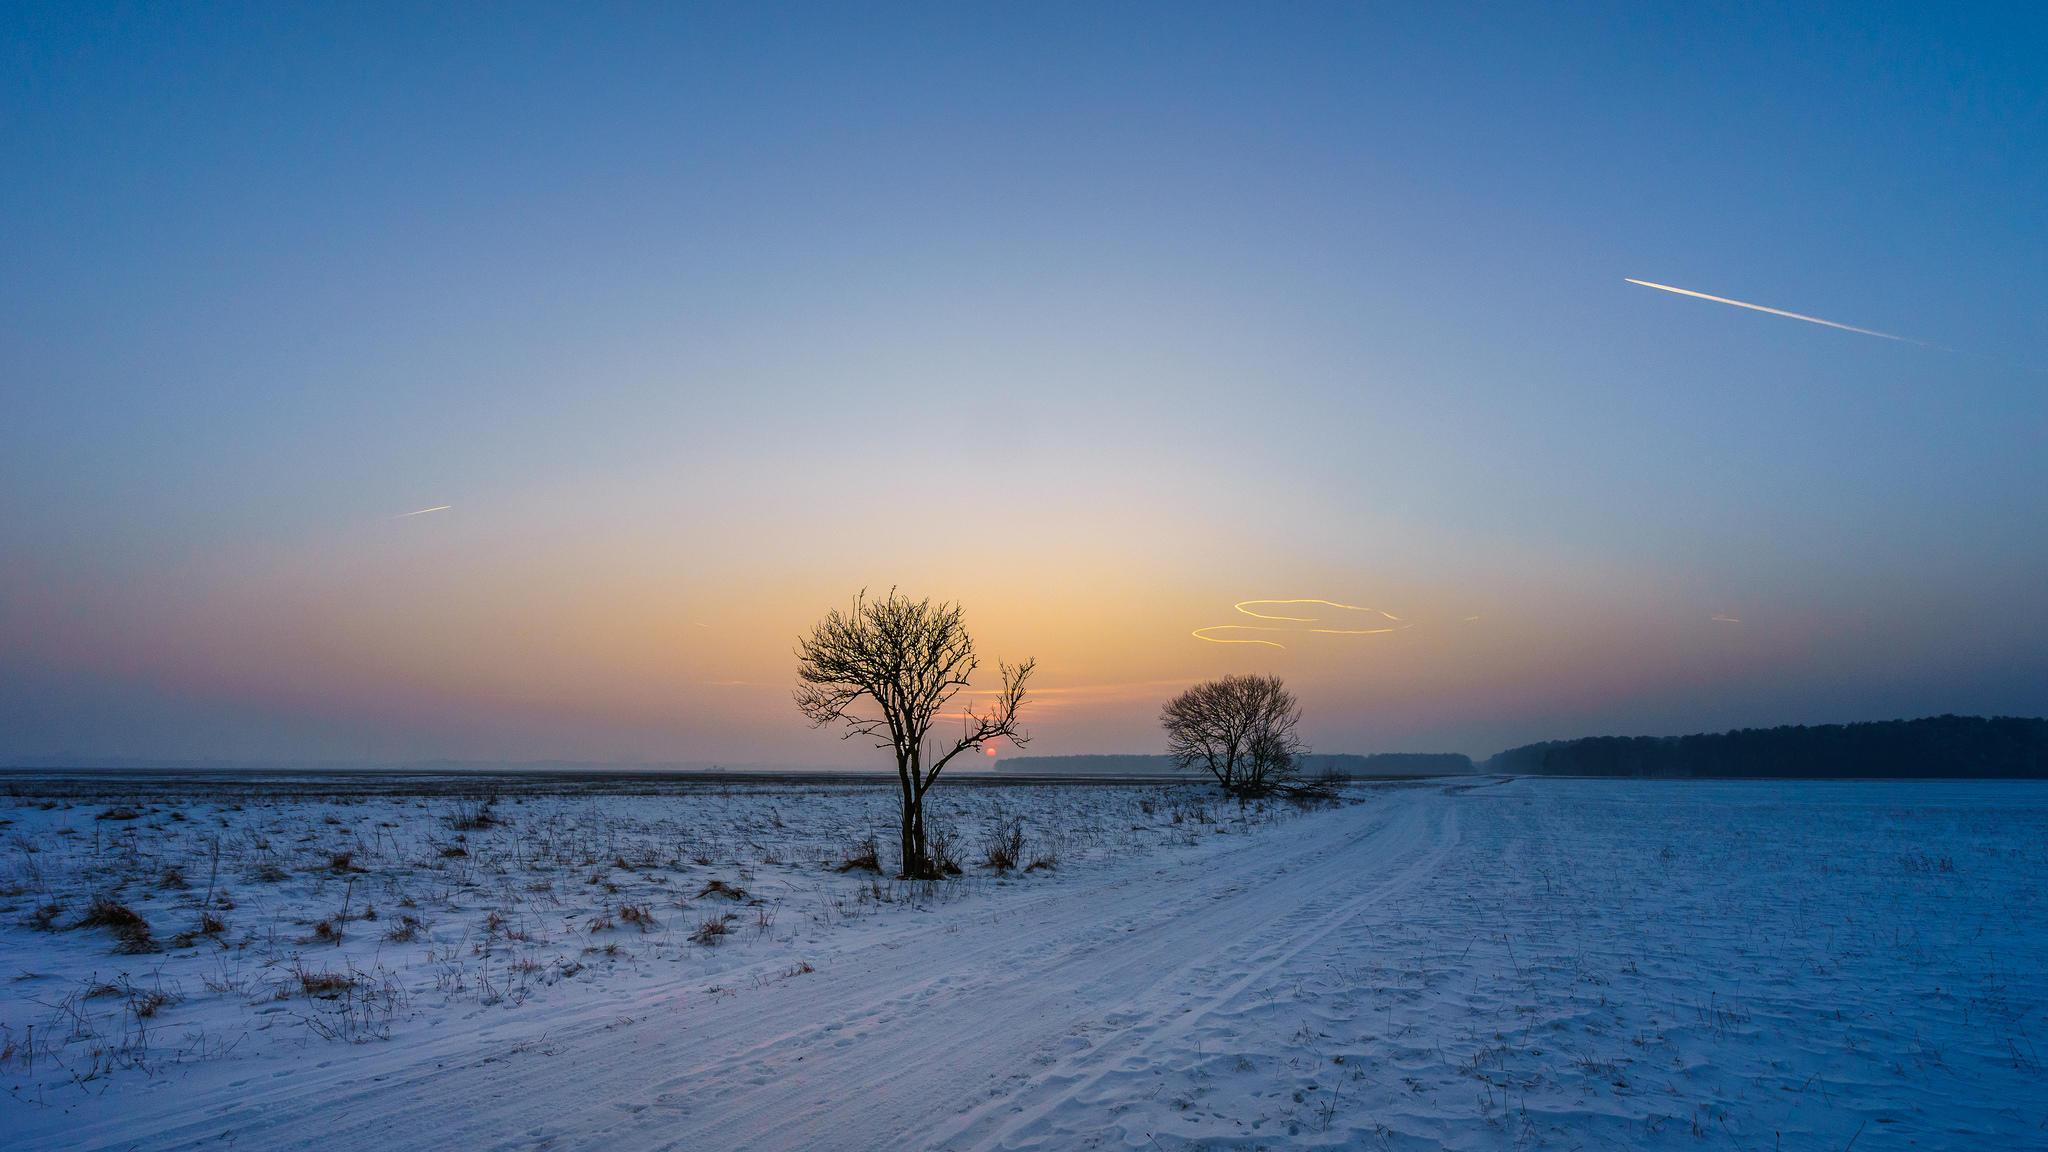 дорога закат зима бесплатно